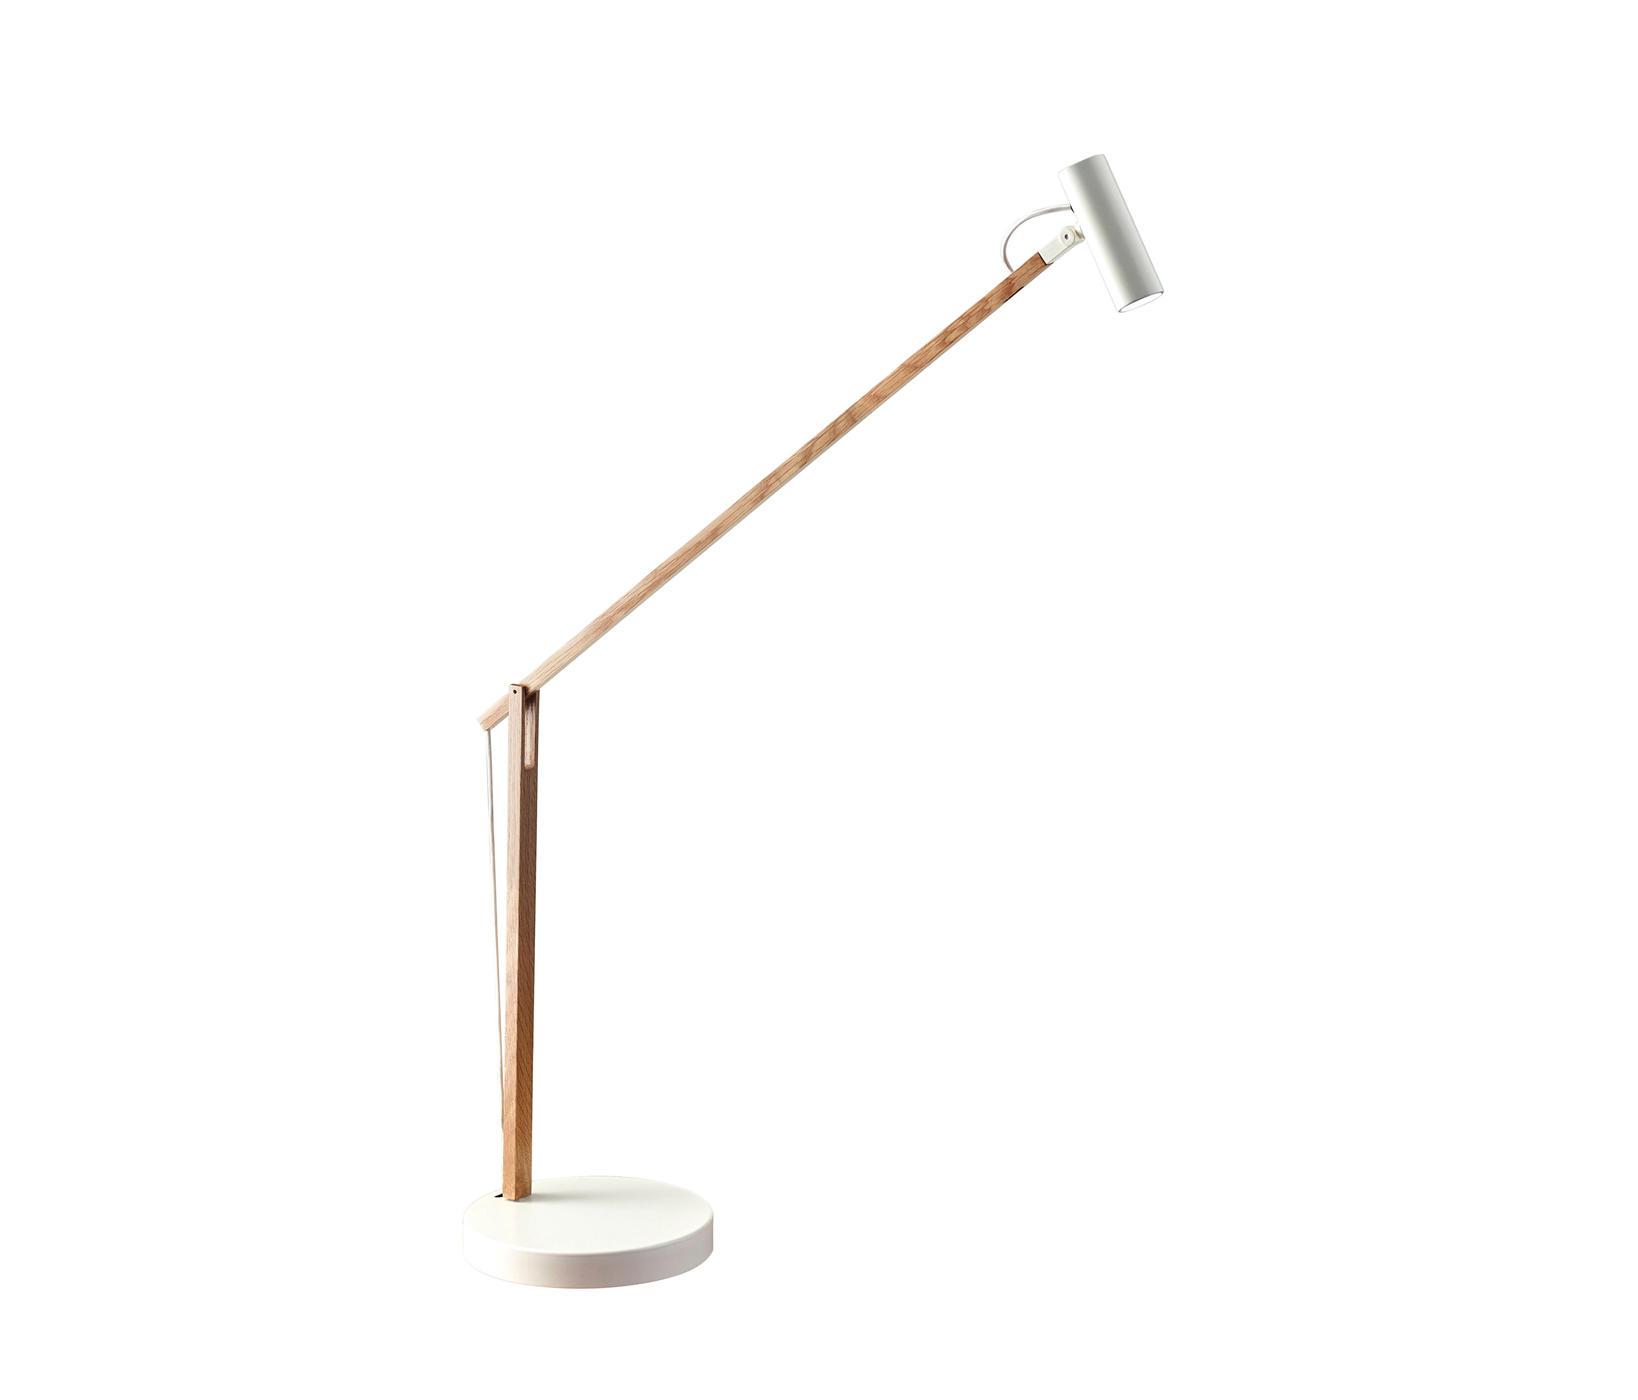 Crane LED Desk Lamp By ADS360 | Table Lights